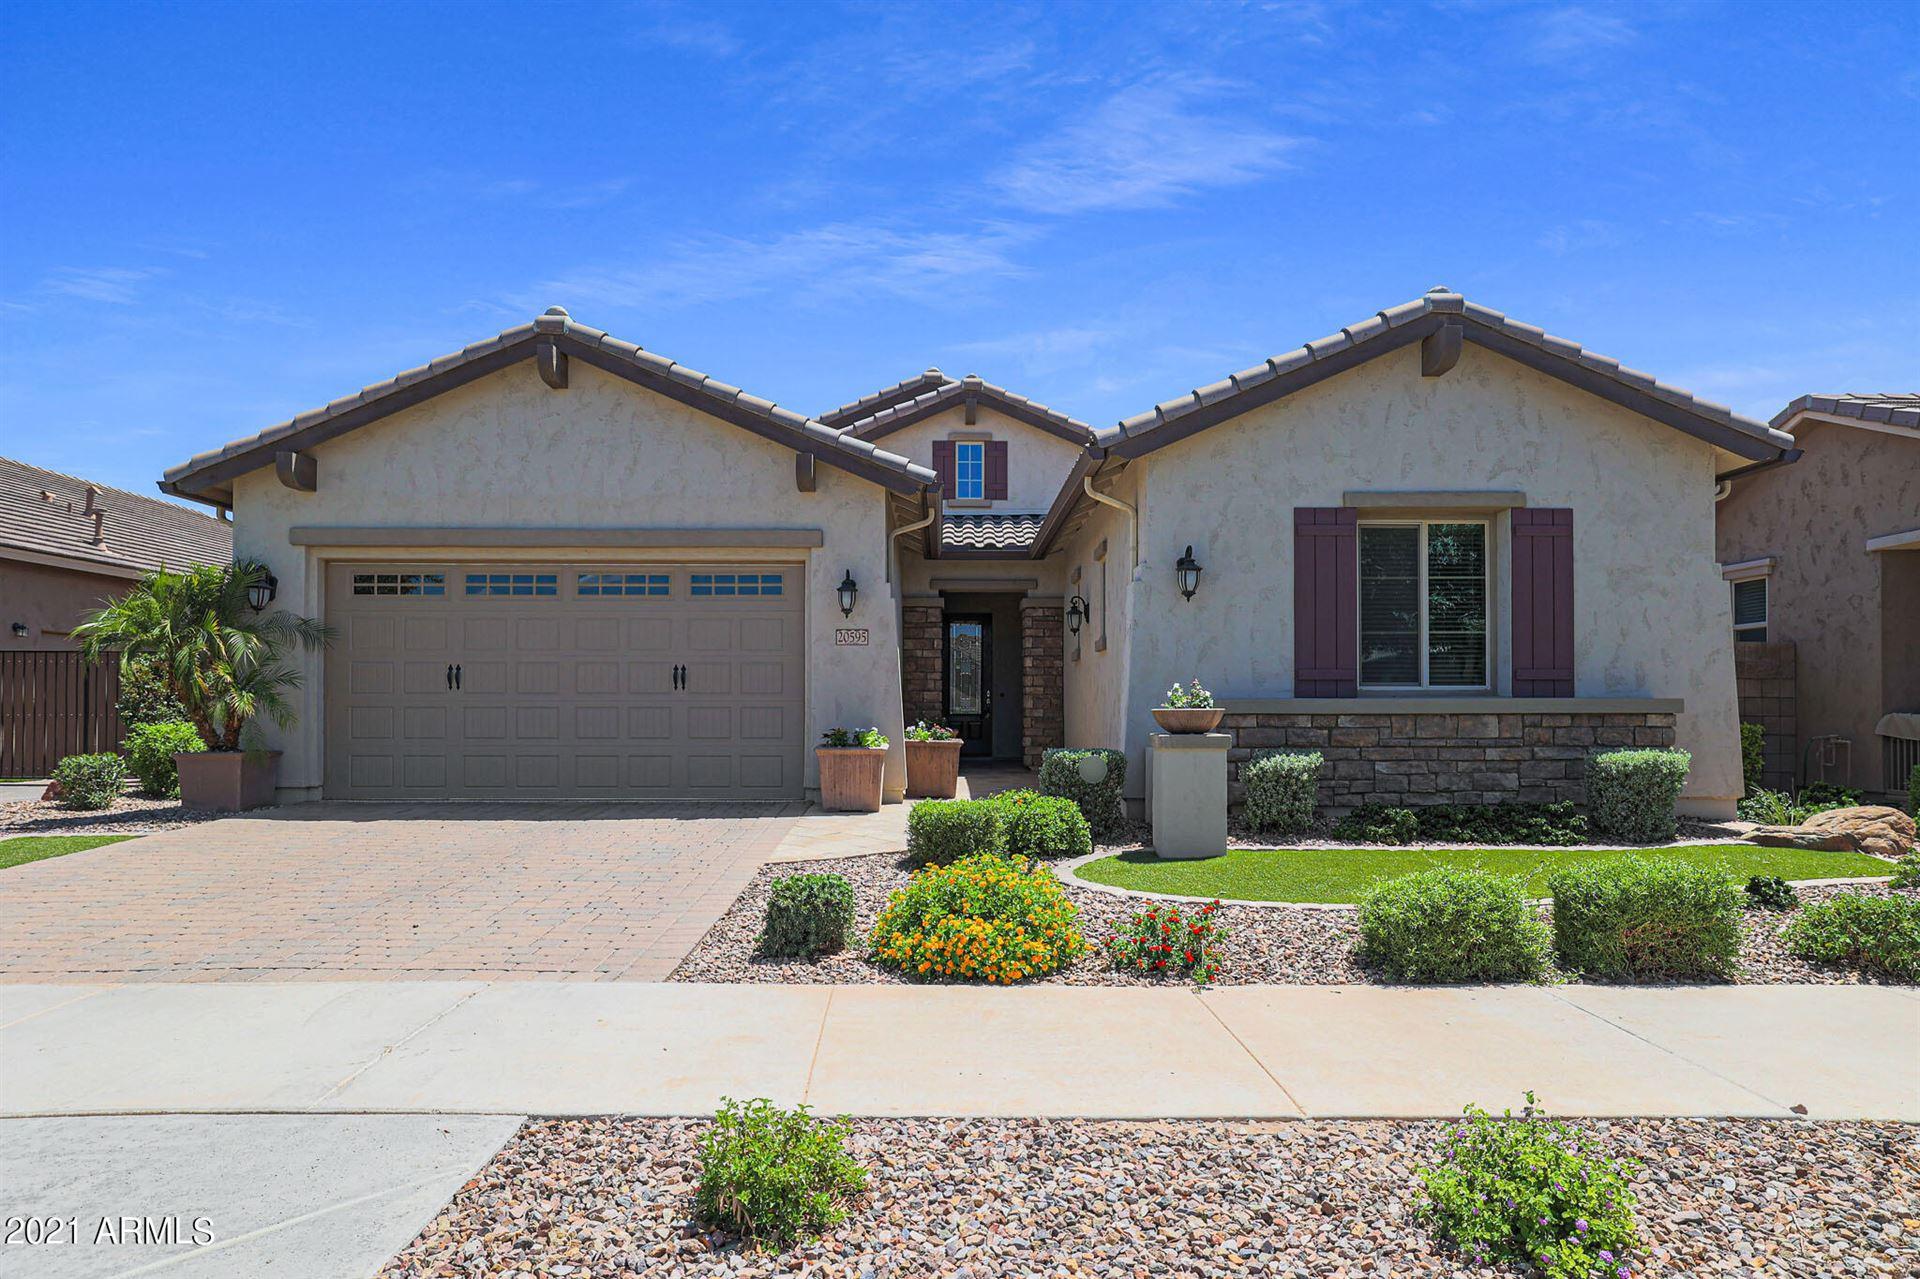 Photo of 20595 E Mockingbird Drive, Queen Creek, AZ 85142 (MLS # 6268710)